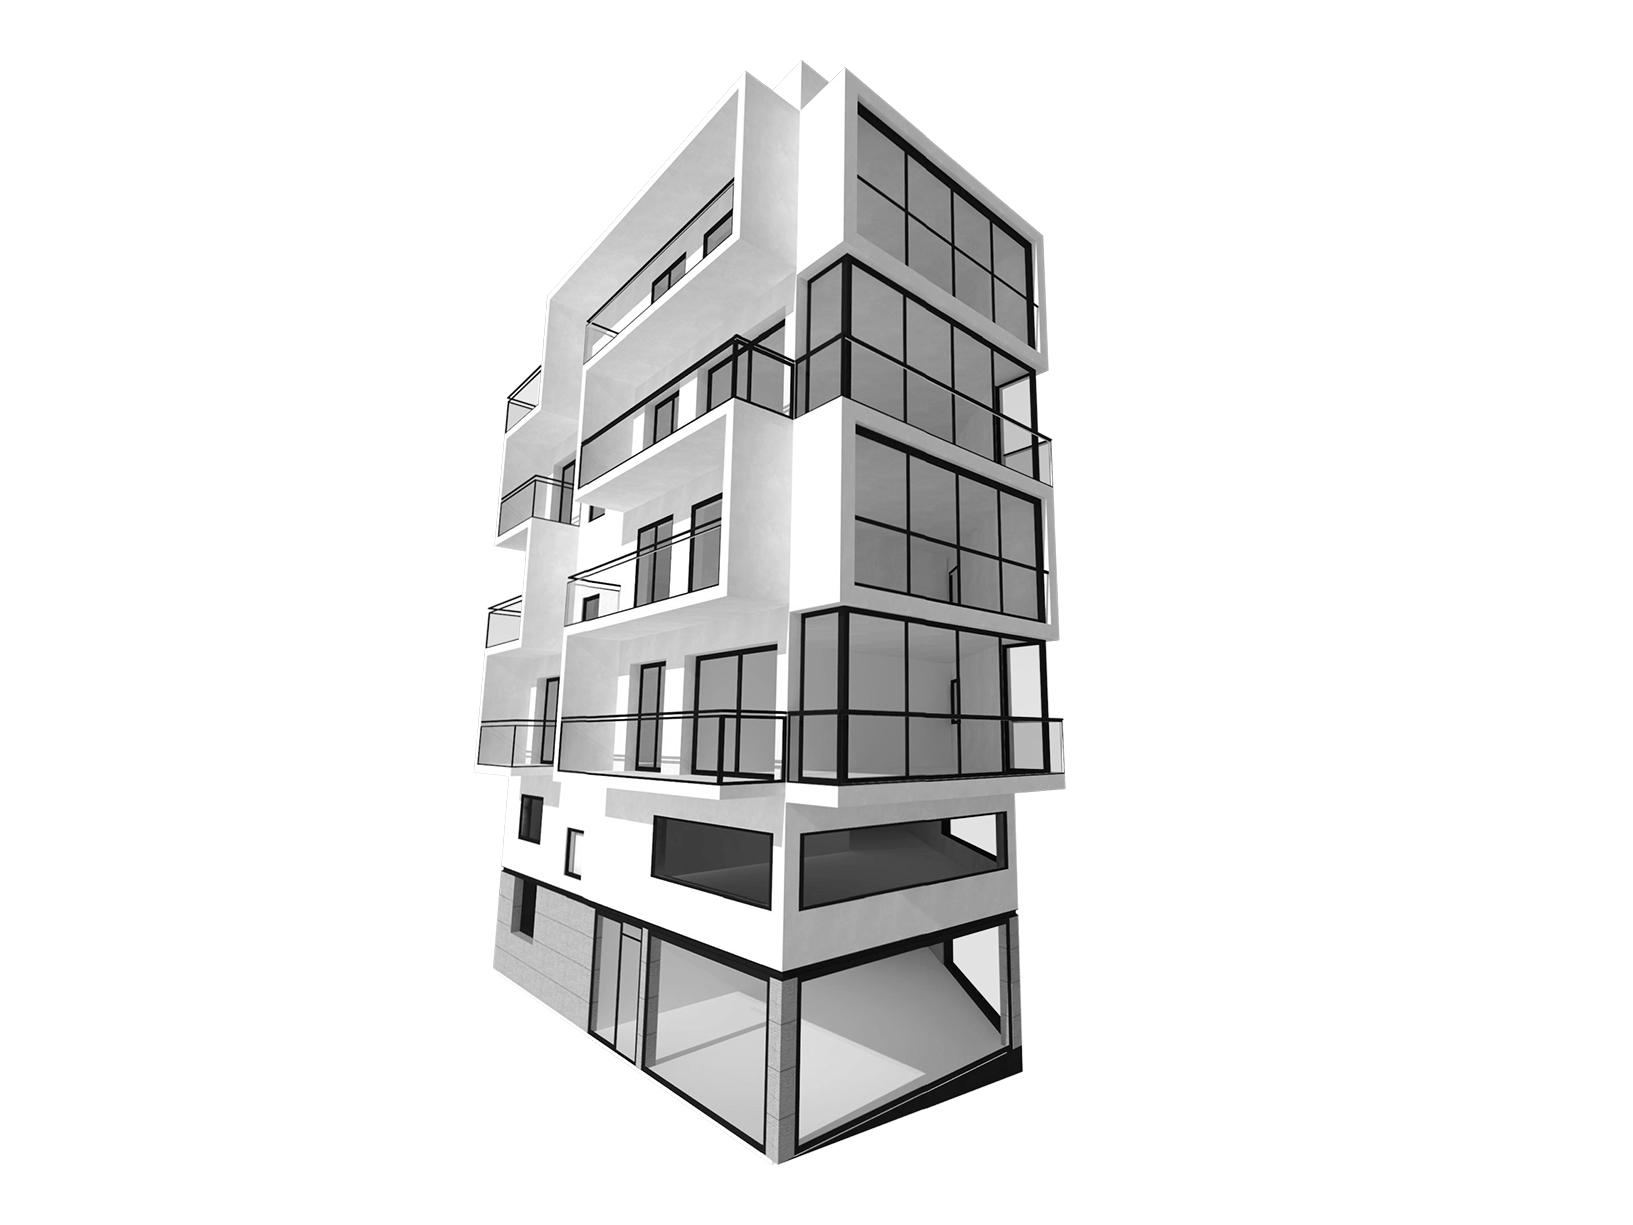 Edificio Coll i Pujol 105, Badalona - Household Makers 4.0